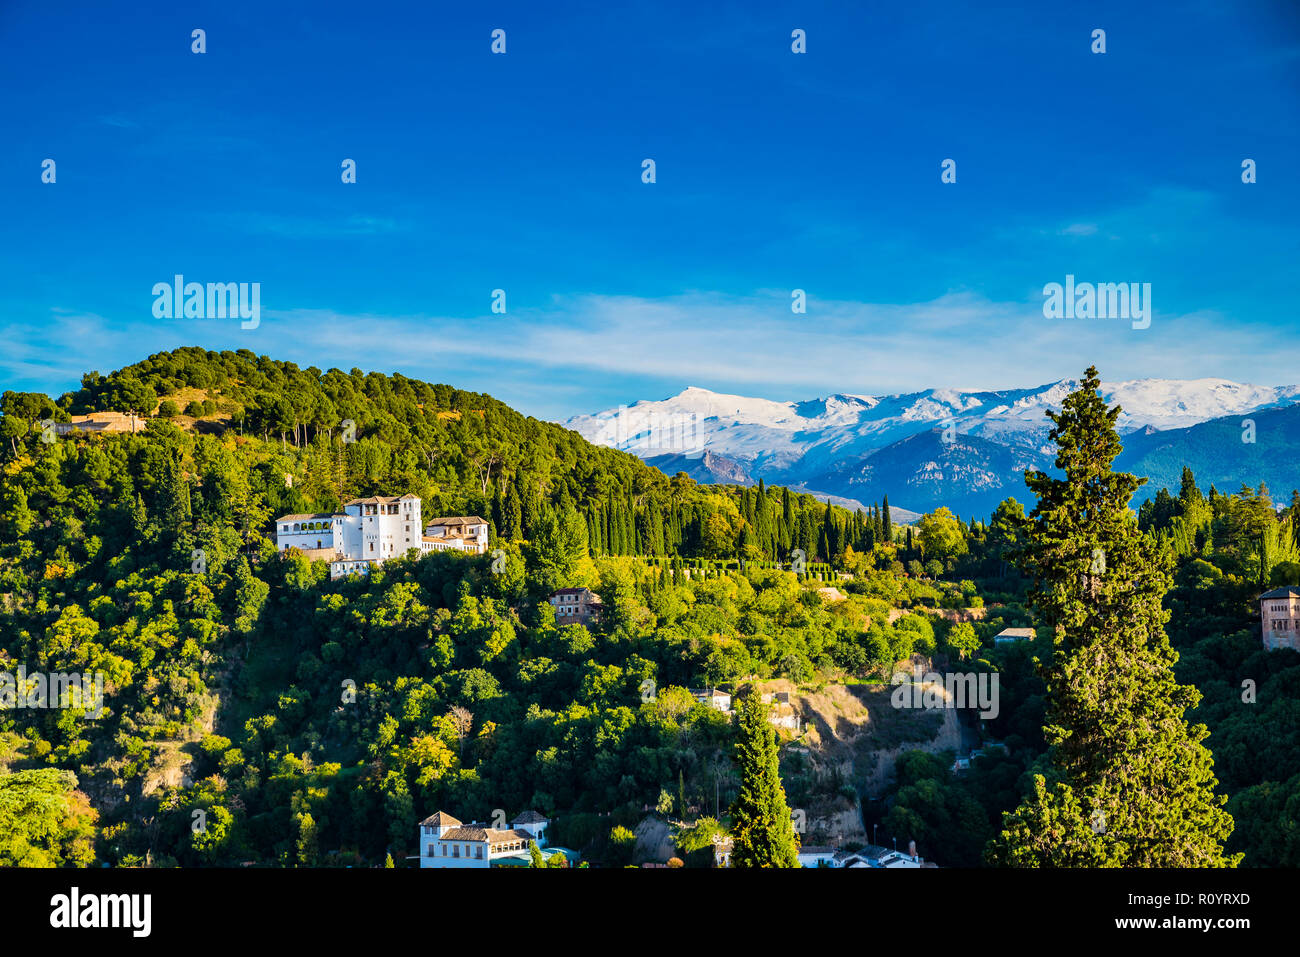 Alhambra. Generalife from Mirador de San Nicolas, in the background Sierra Nevada. Granada, Andalucia, Spain, Europe. - Stock Image